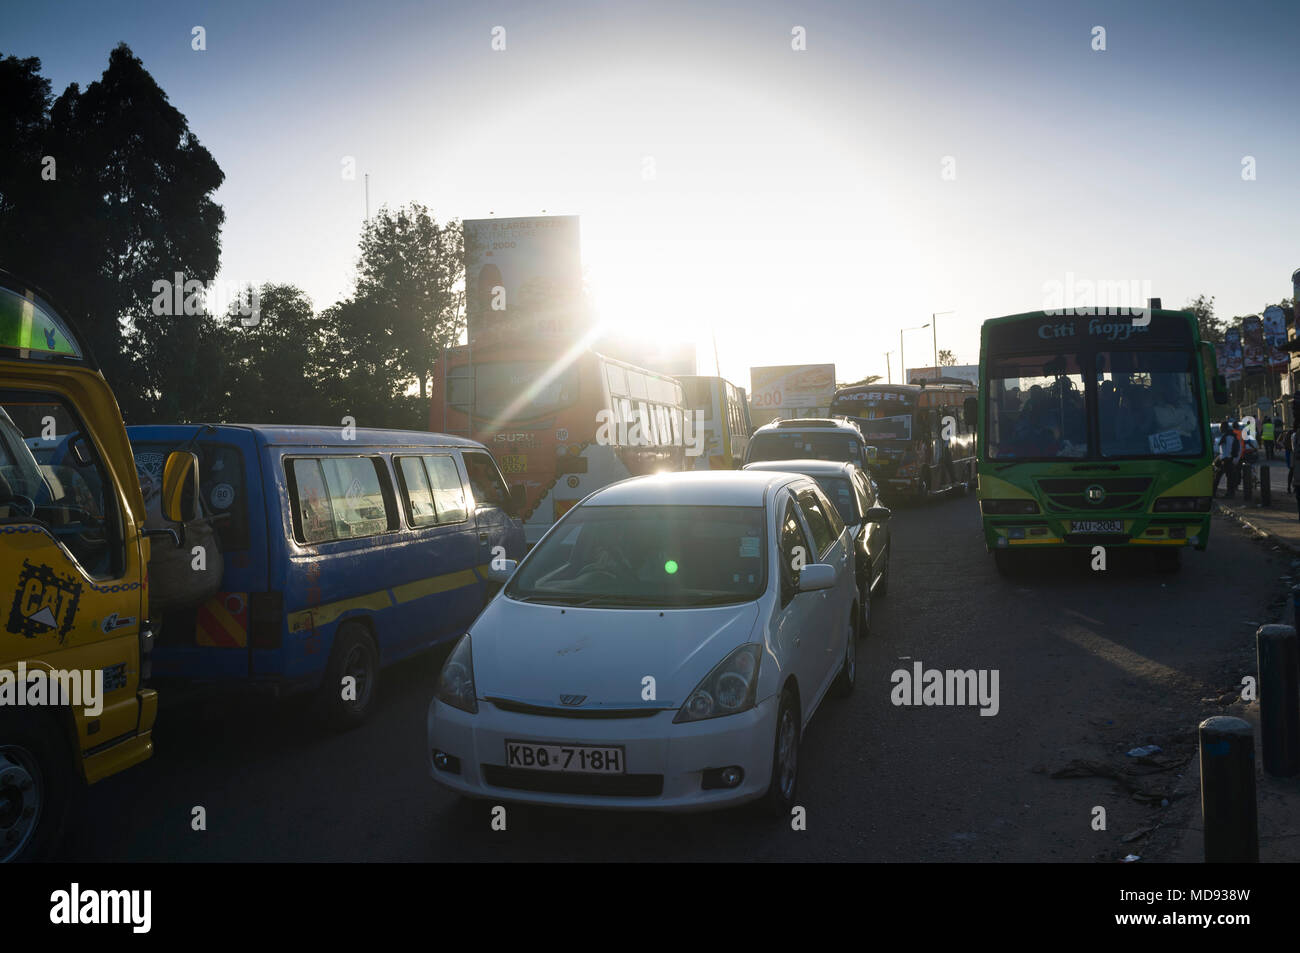 Evening rush hour, traffic congestion, Ngong Road, Nairobi, Kenya - Stock Image